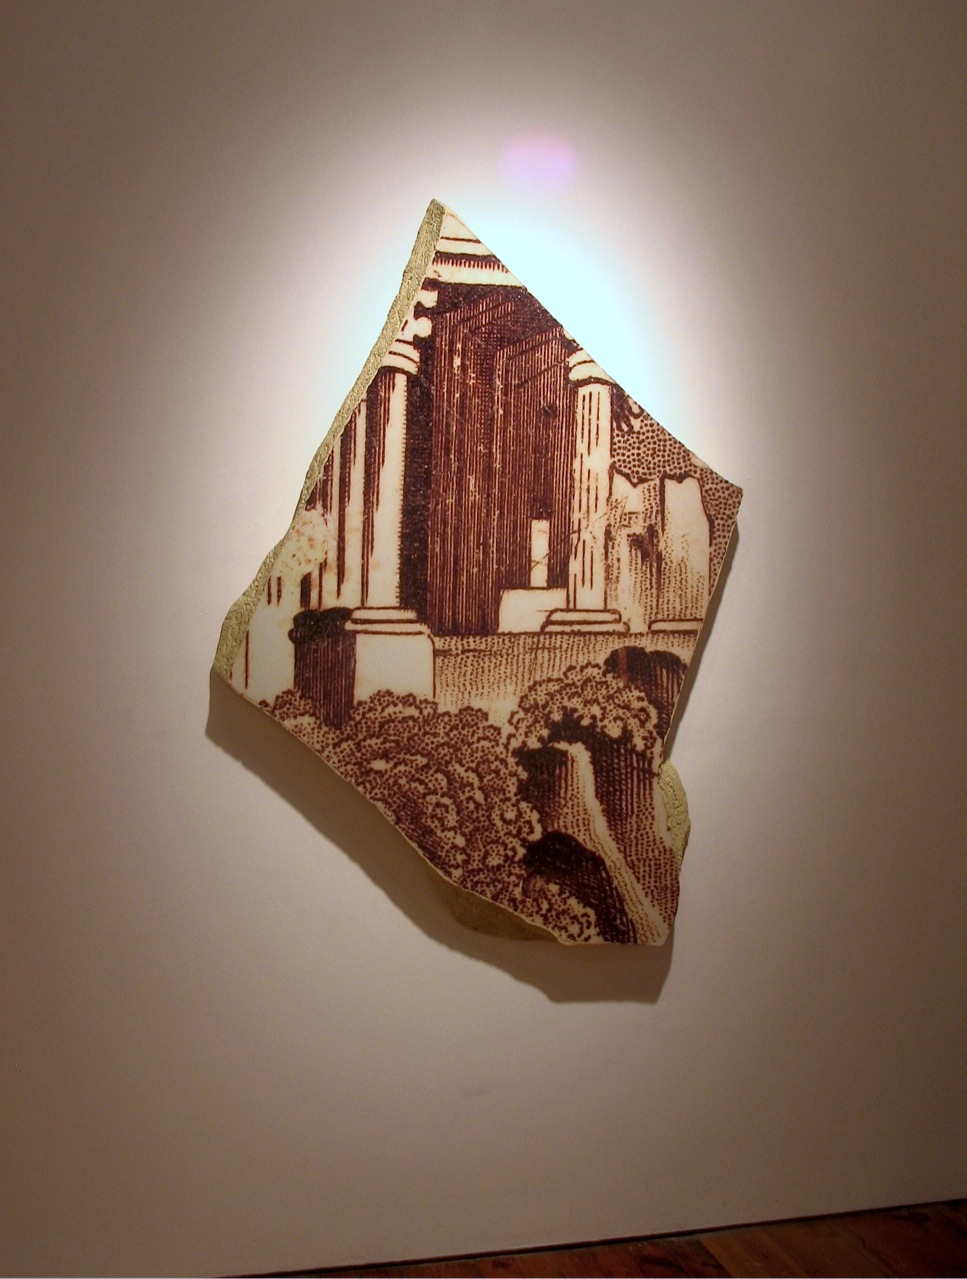 Classical Folly Shard Photo, mixed media 173 x 122 x 8 cm, 2008 - 09